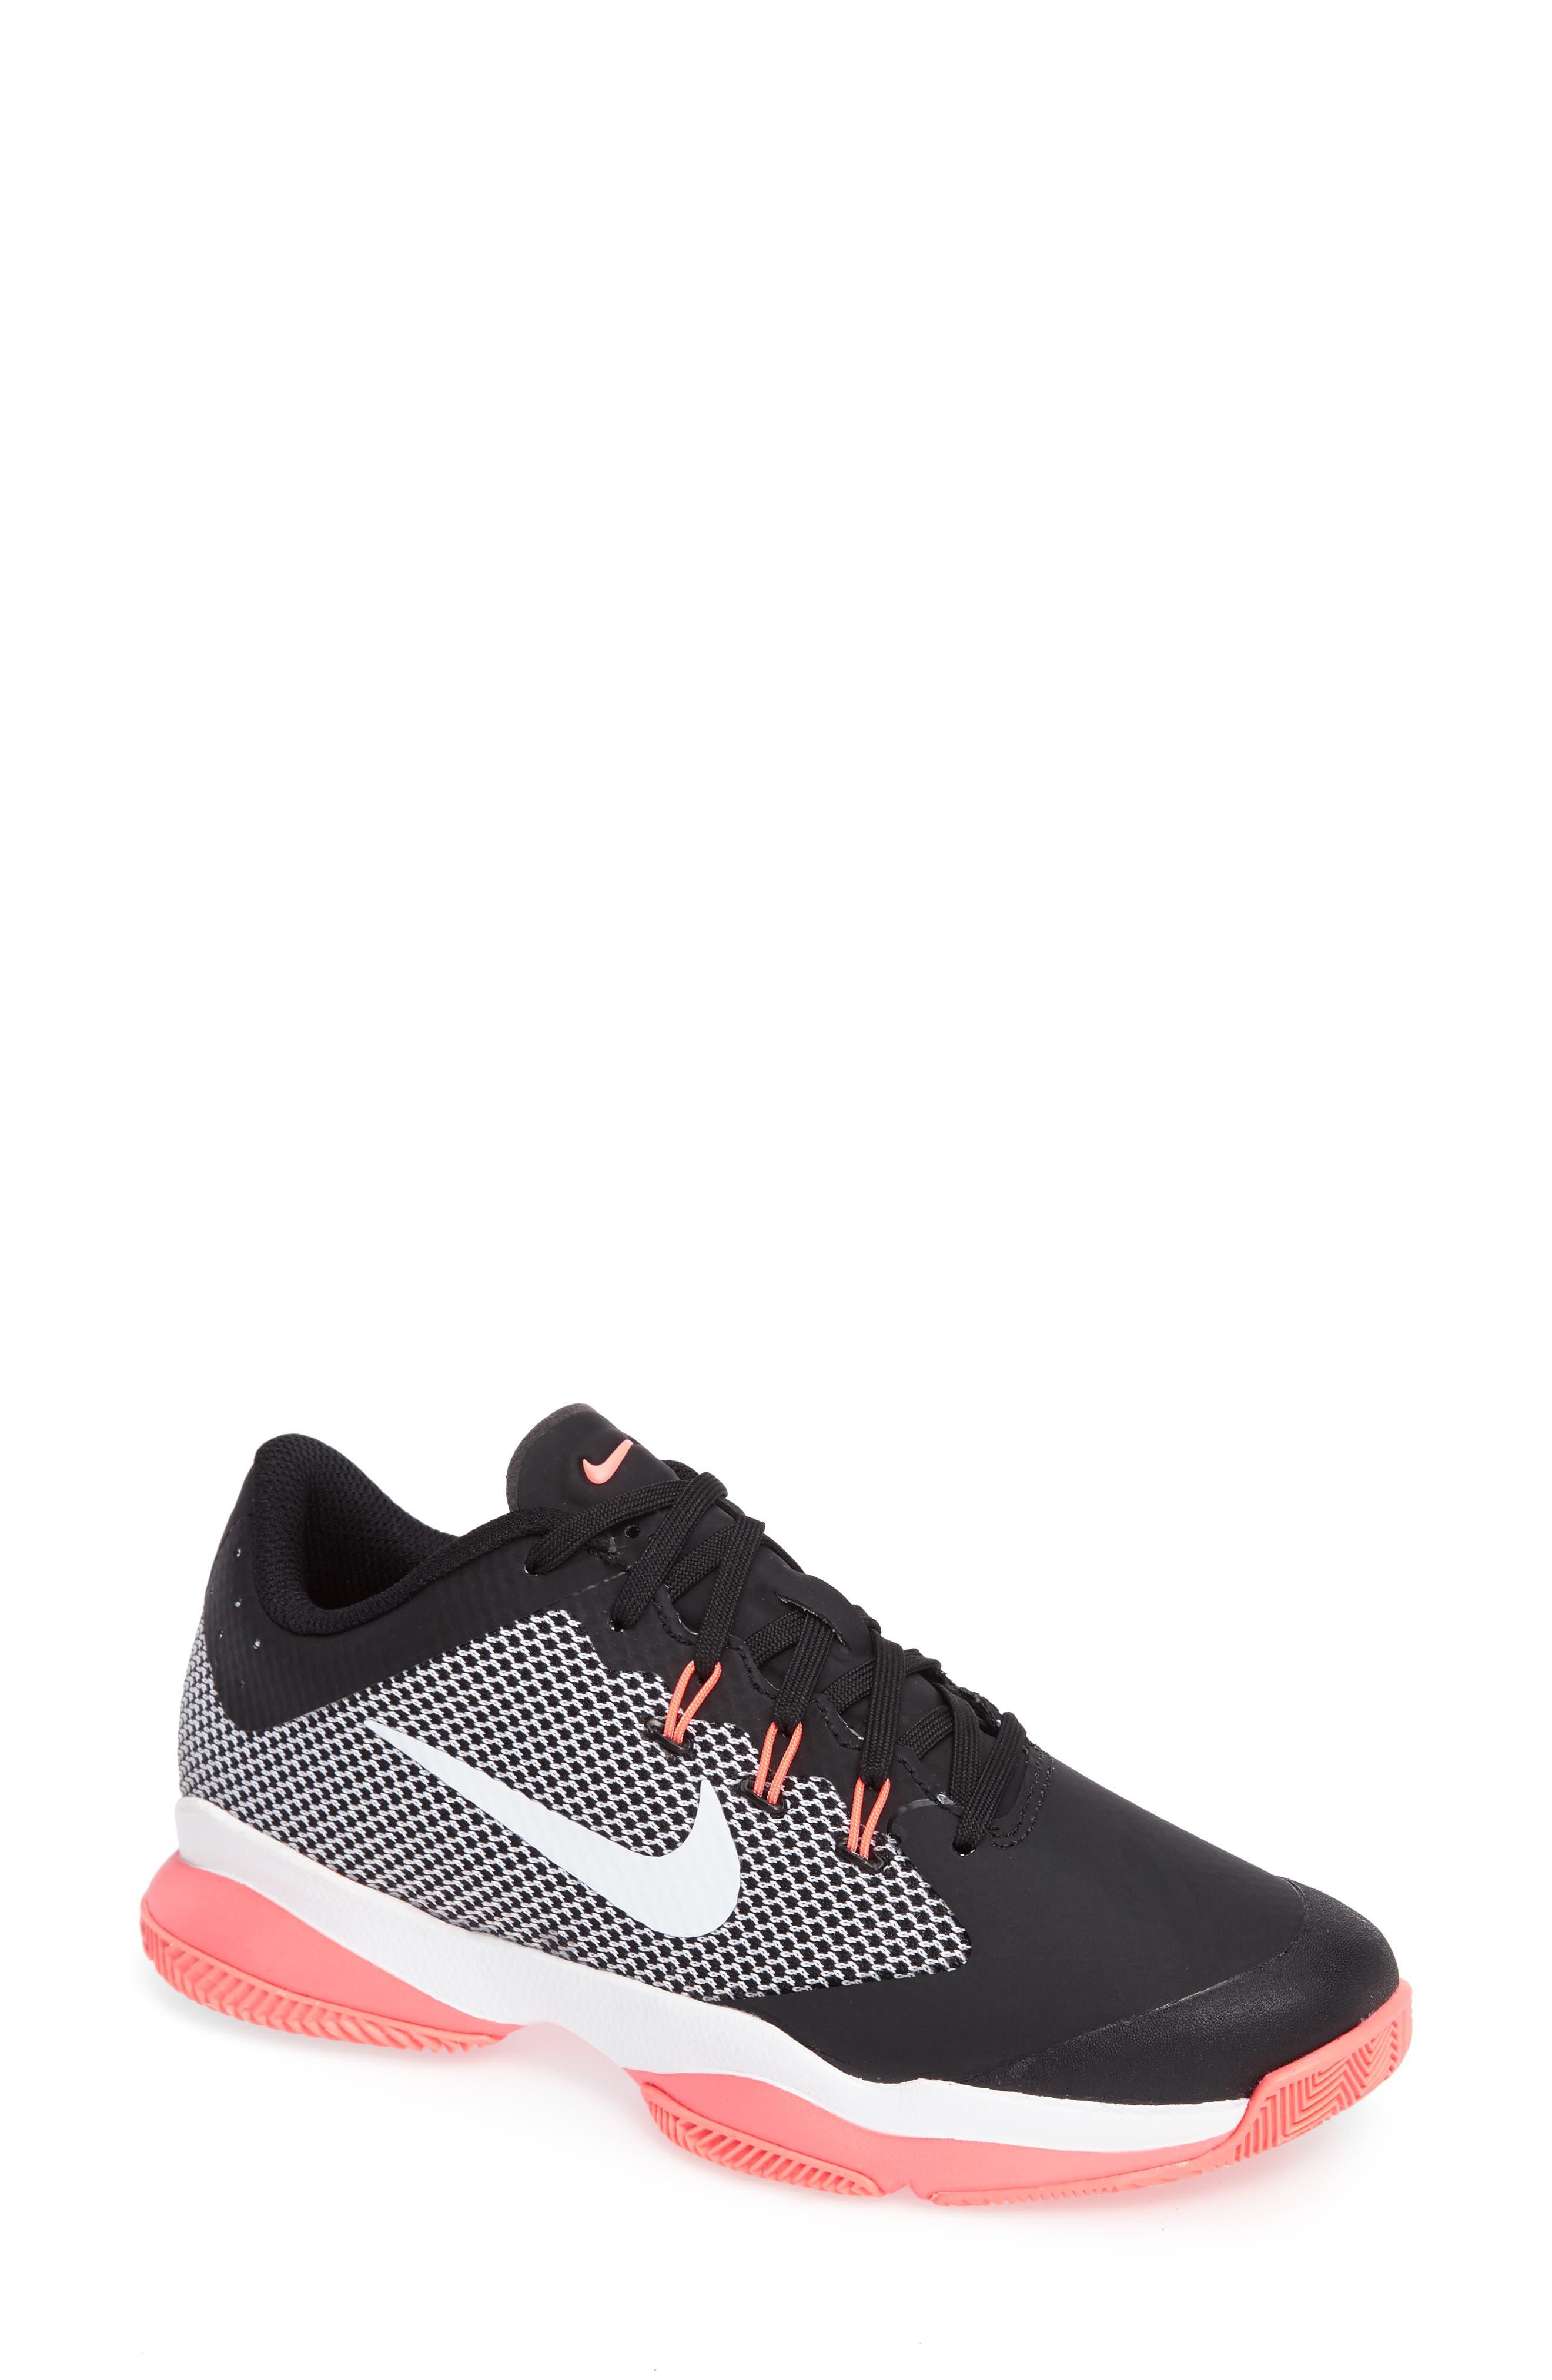 Alternate Image 1 Selected - Nike Court Air Zoom Ultra Tennis Shoe (Women)